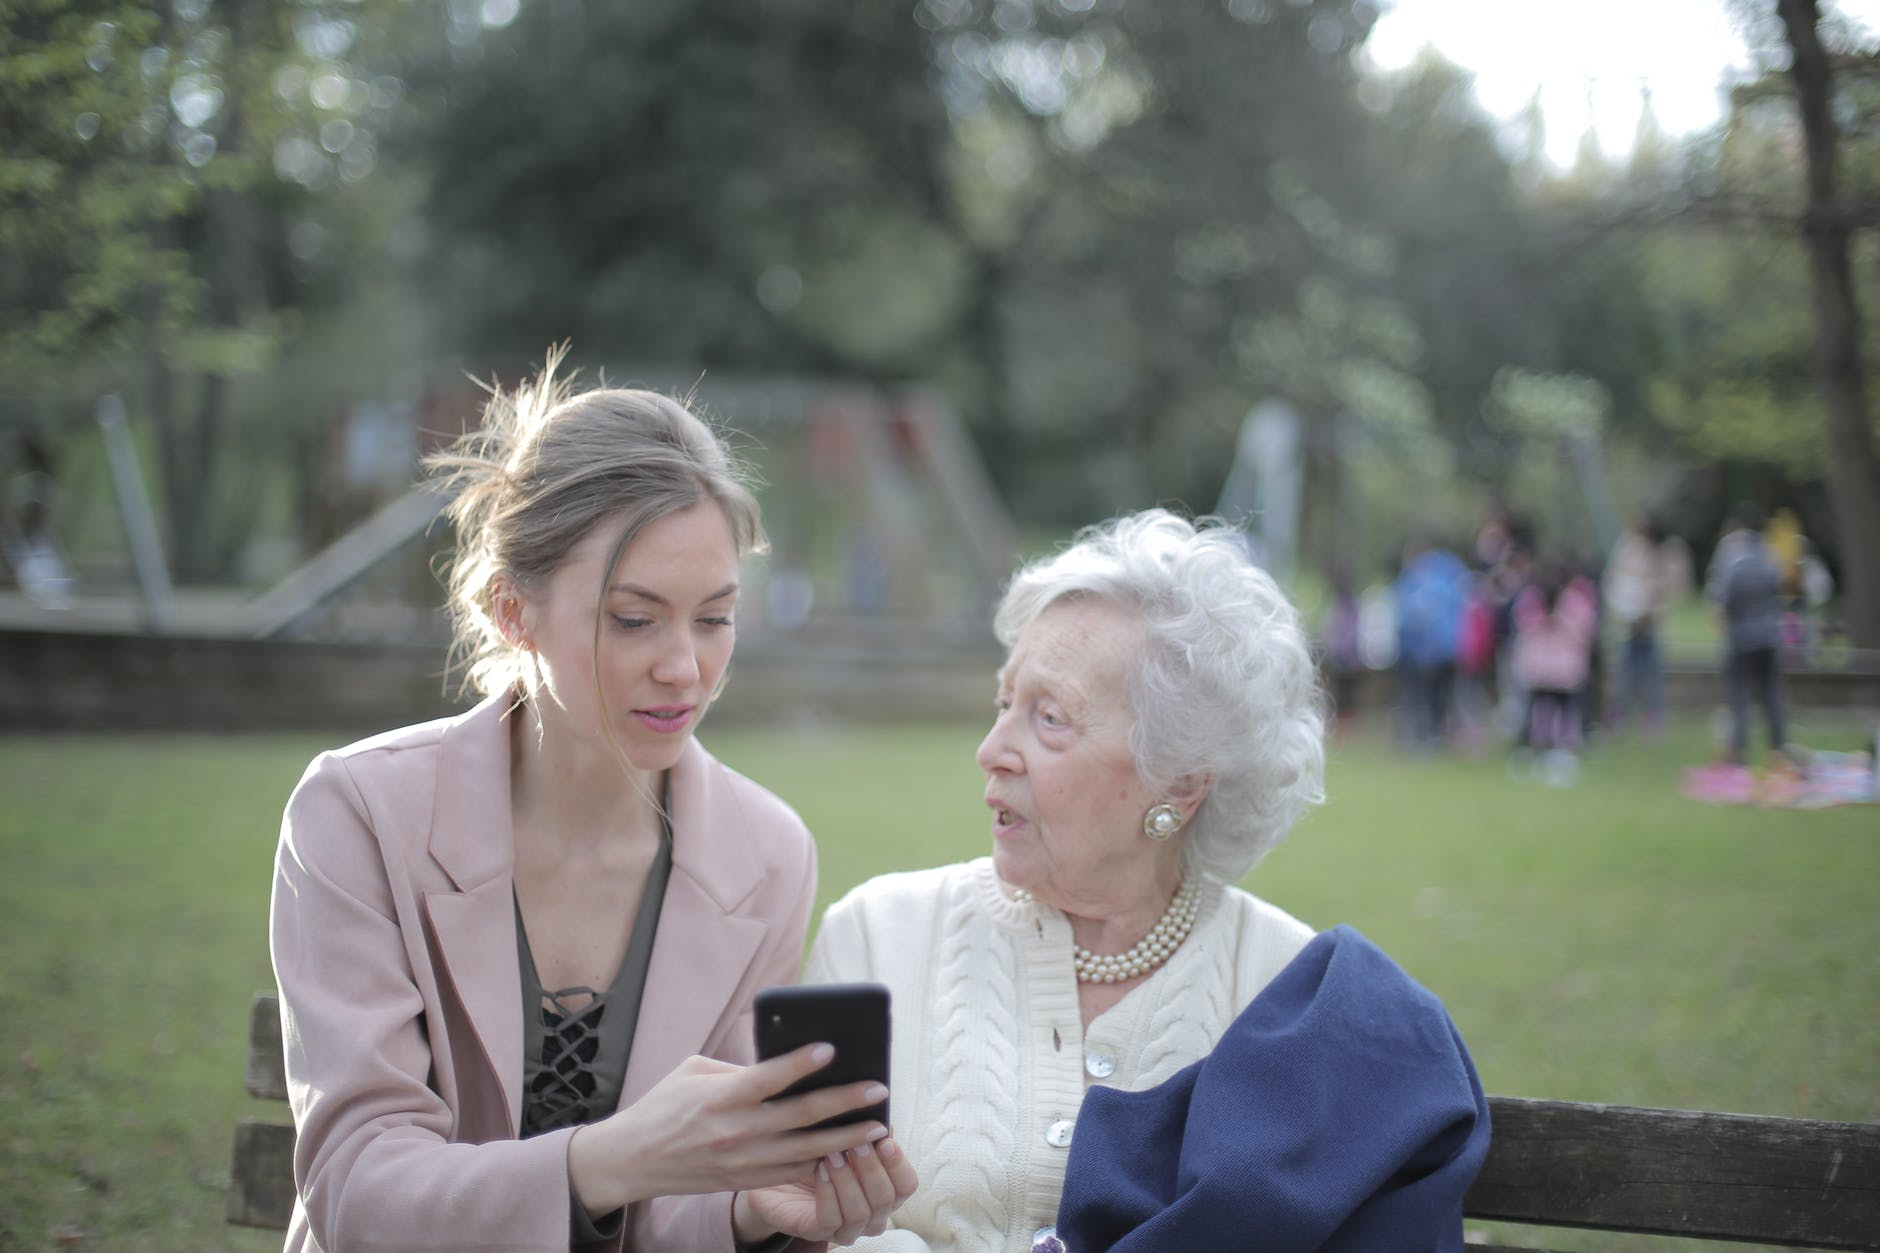 adult daughter teaching senior mother using smartphone in park